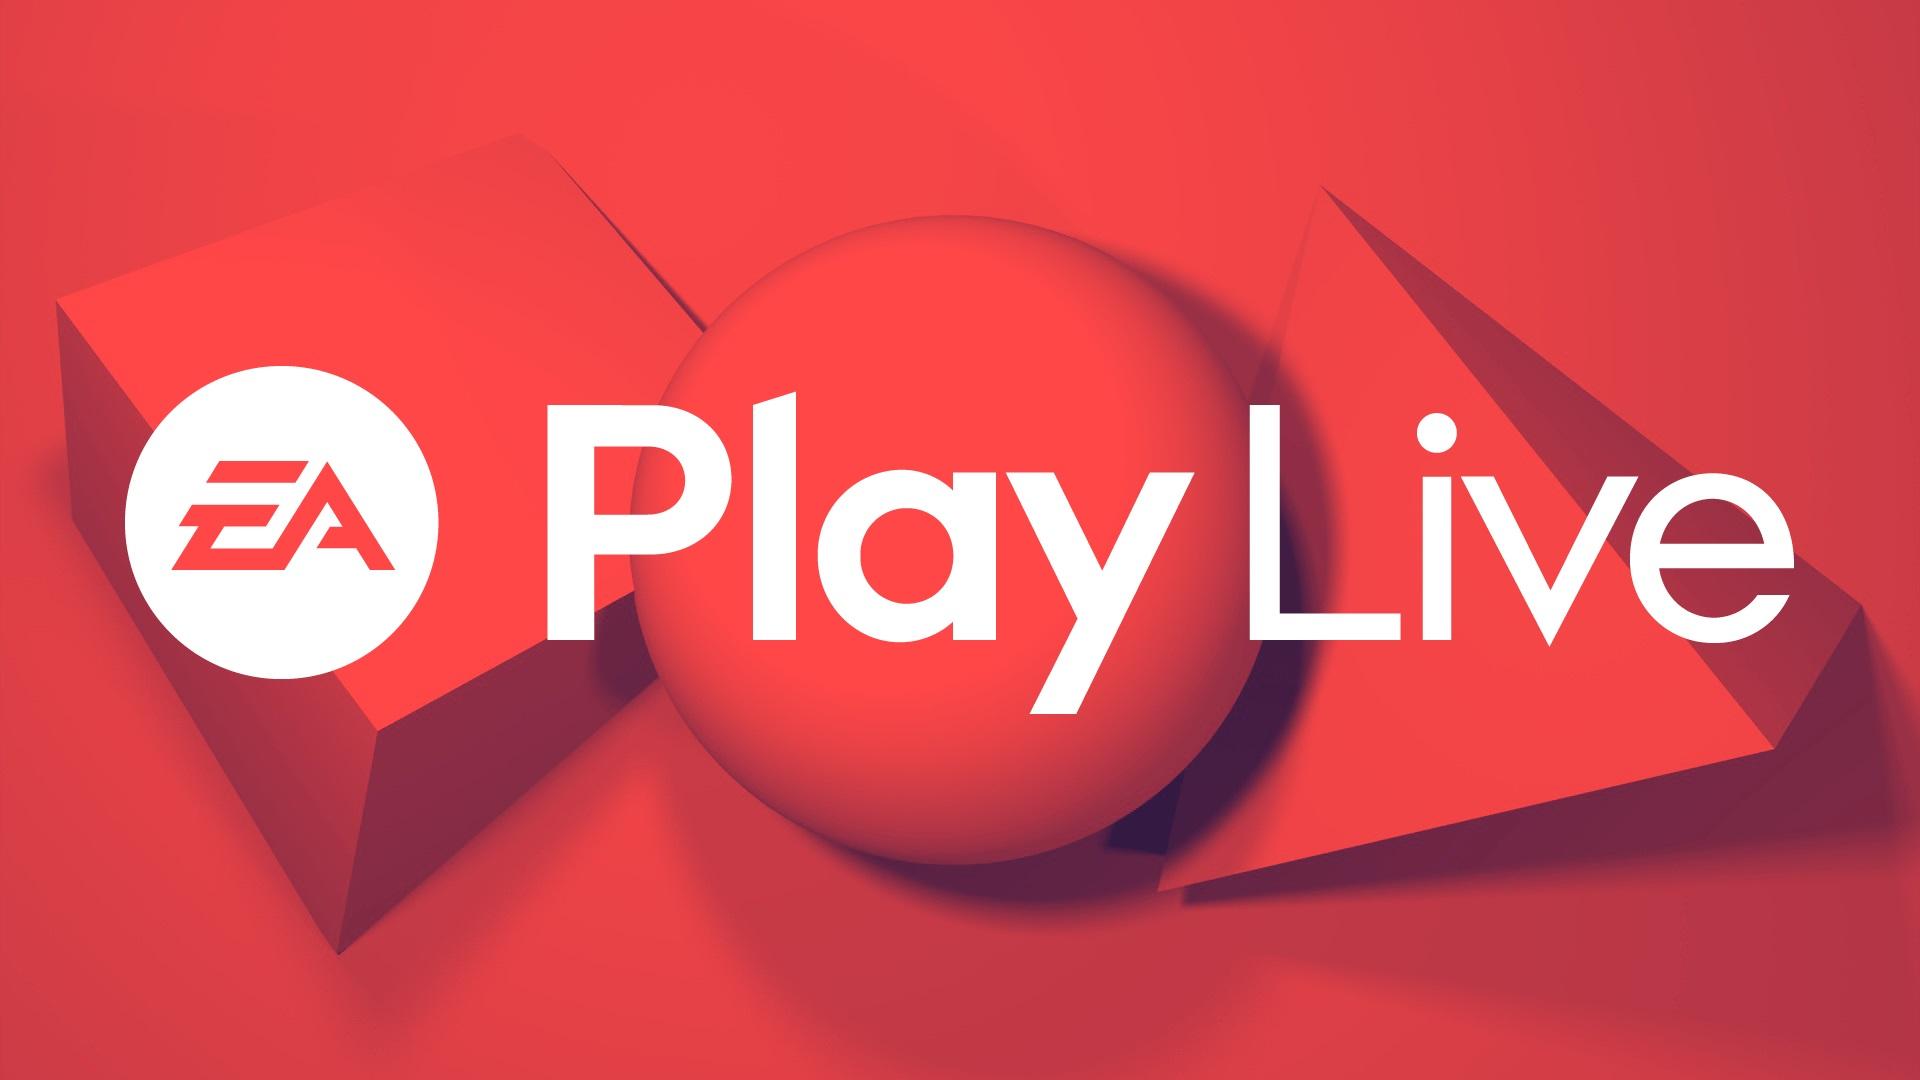 EA Play Live Show